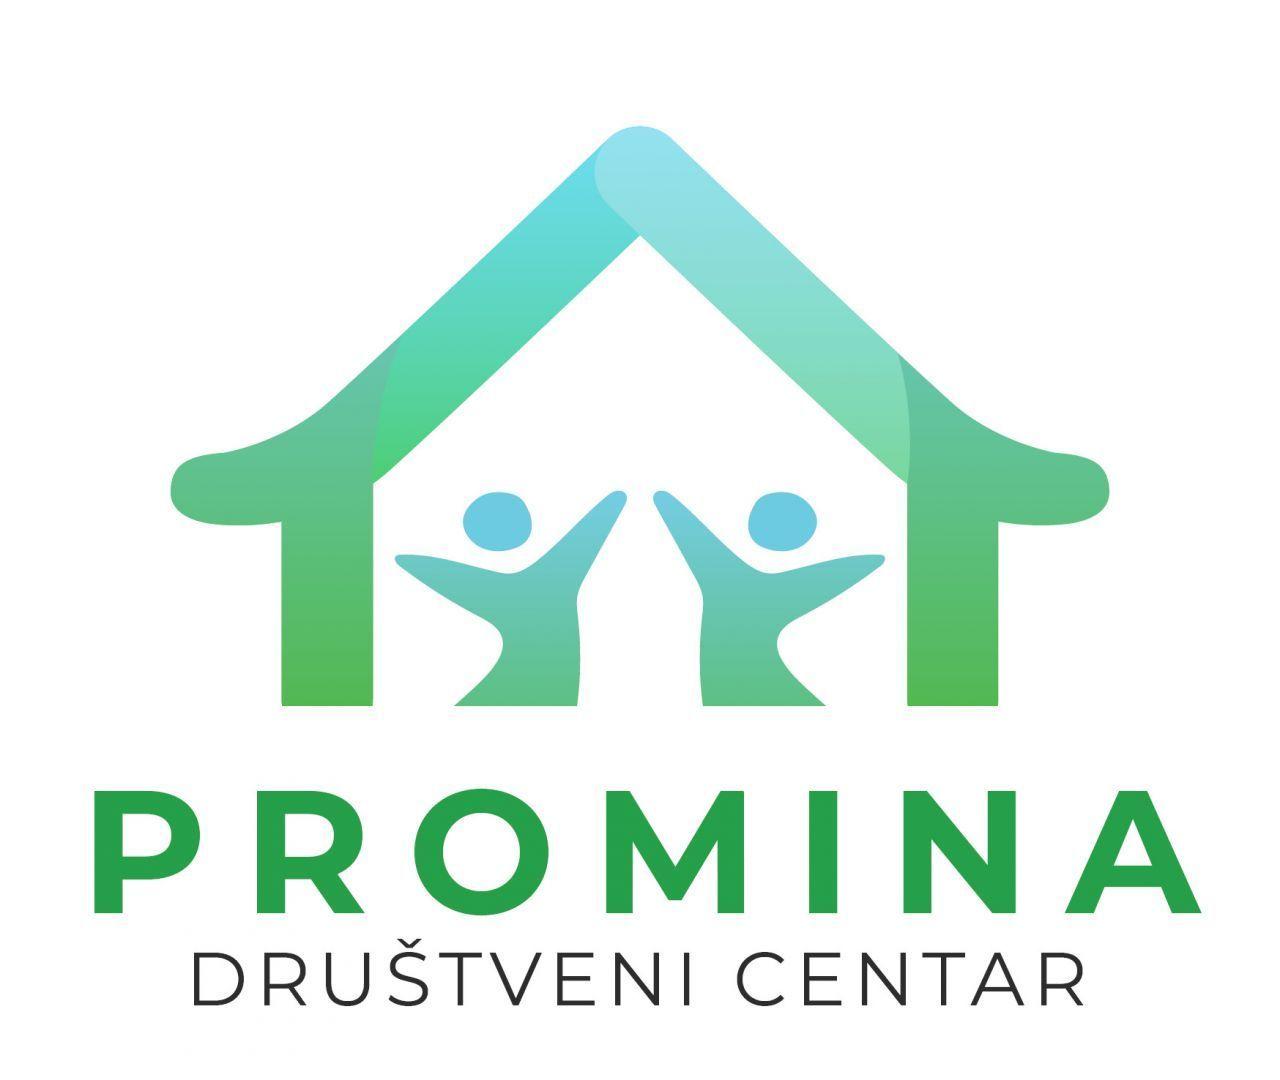 Društveni centar Promina - Kalendar događanja za 04/2021.